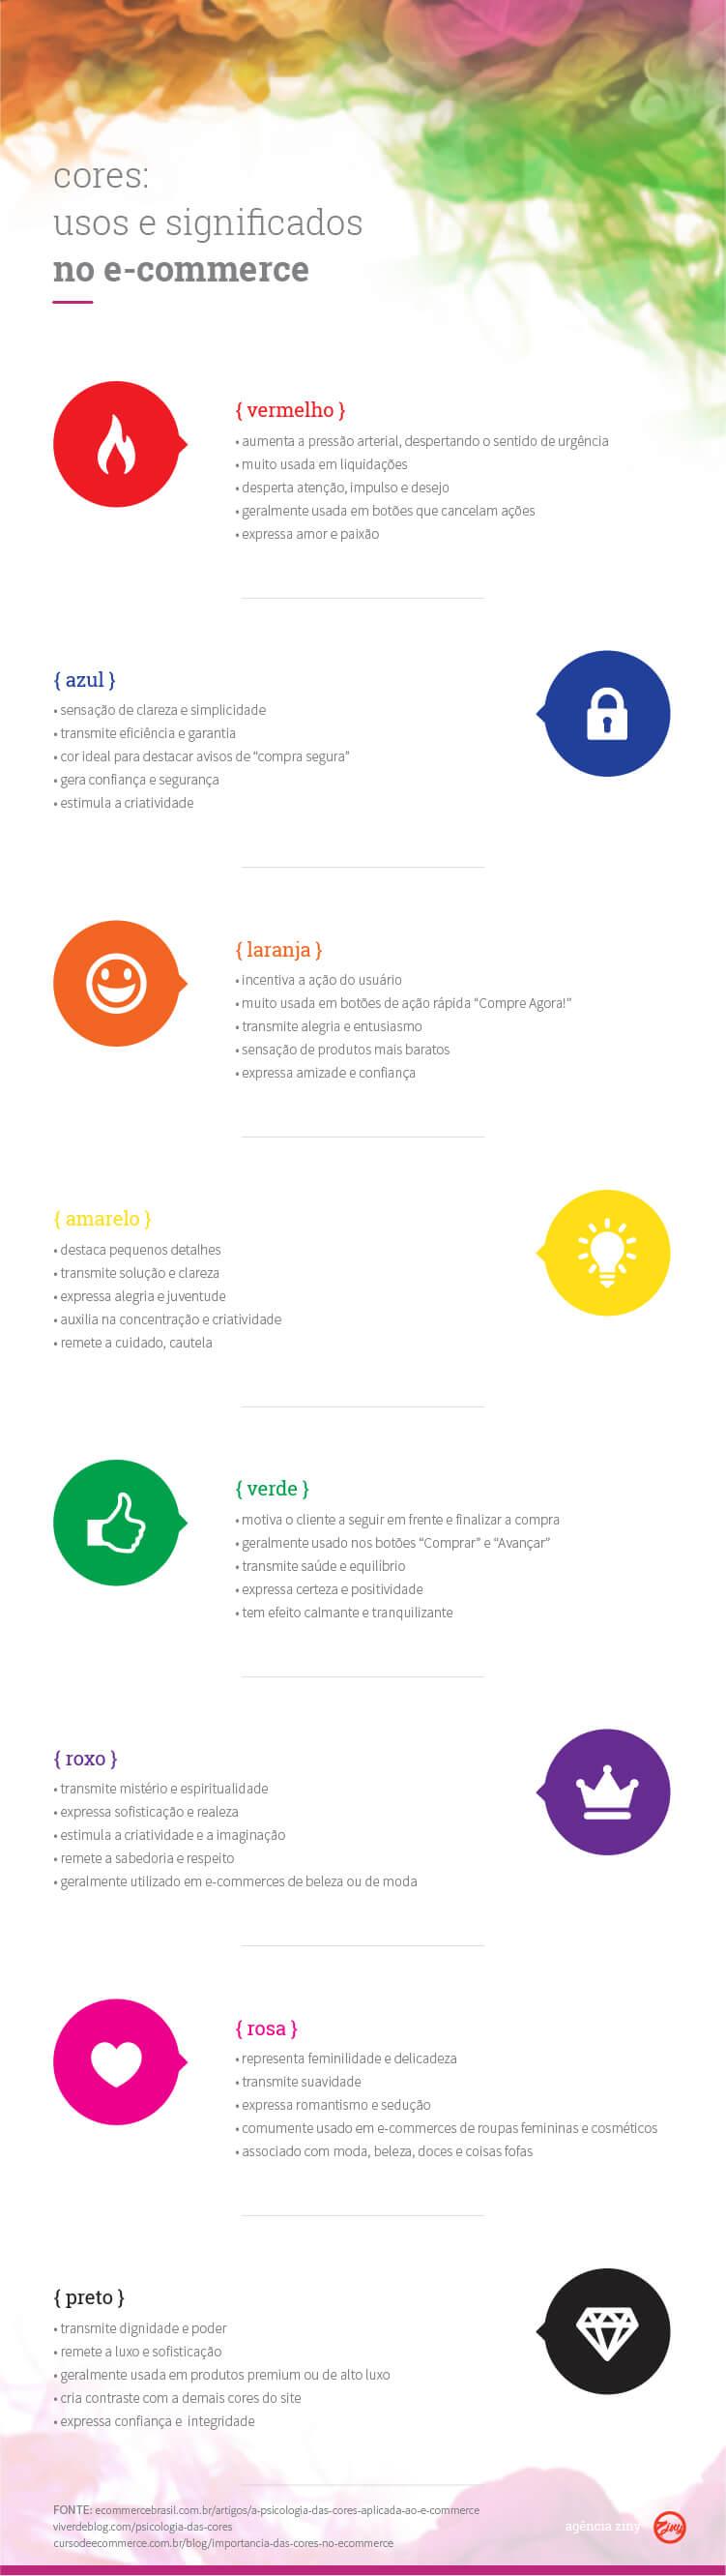 Infográfico sobre as cores, seus usos e significados no e-commerce